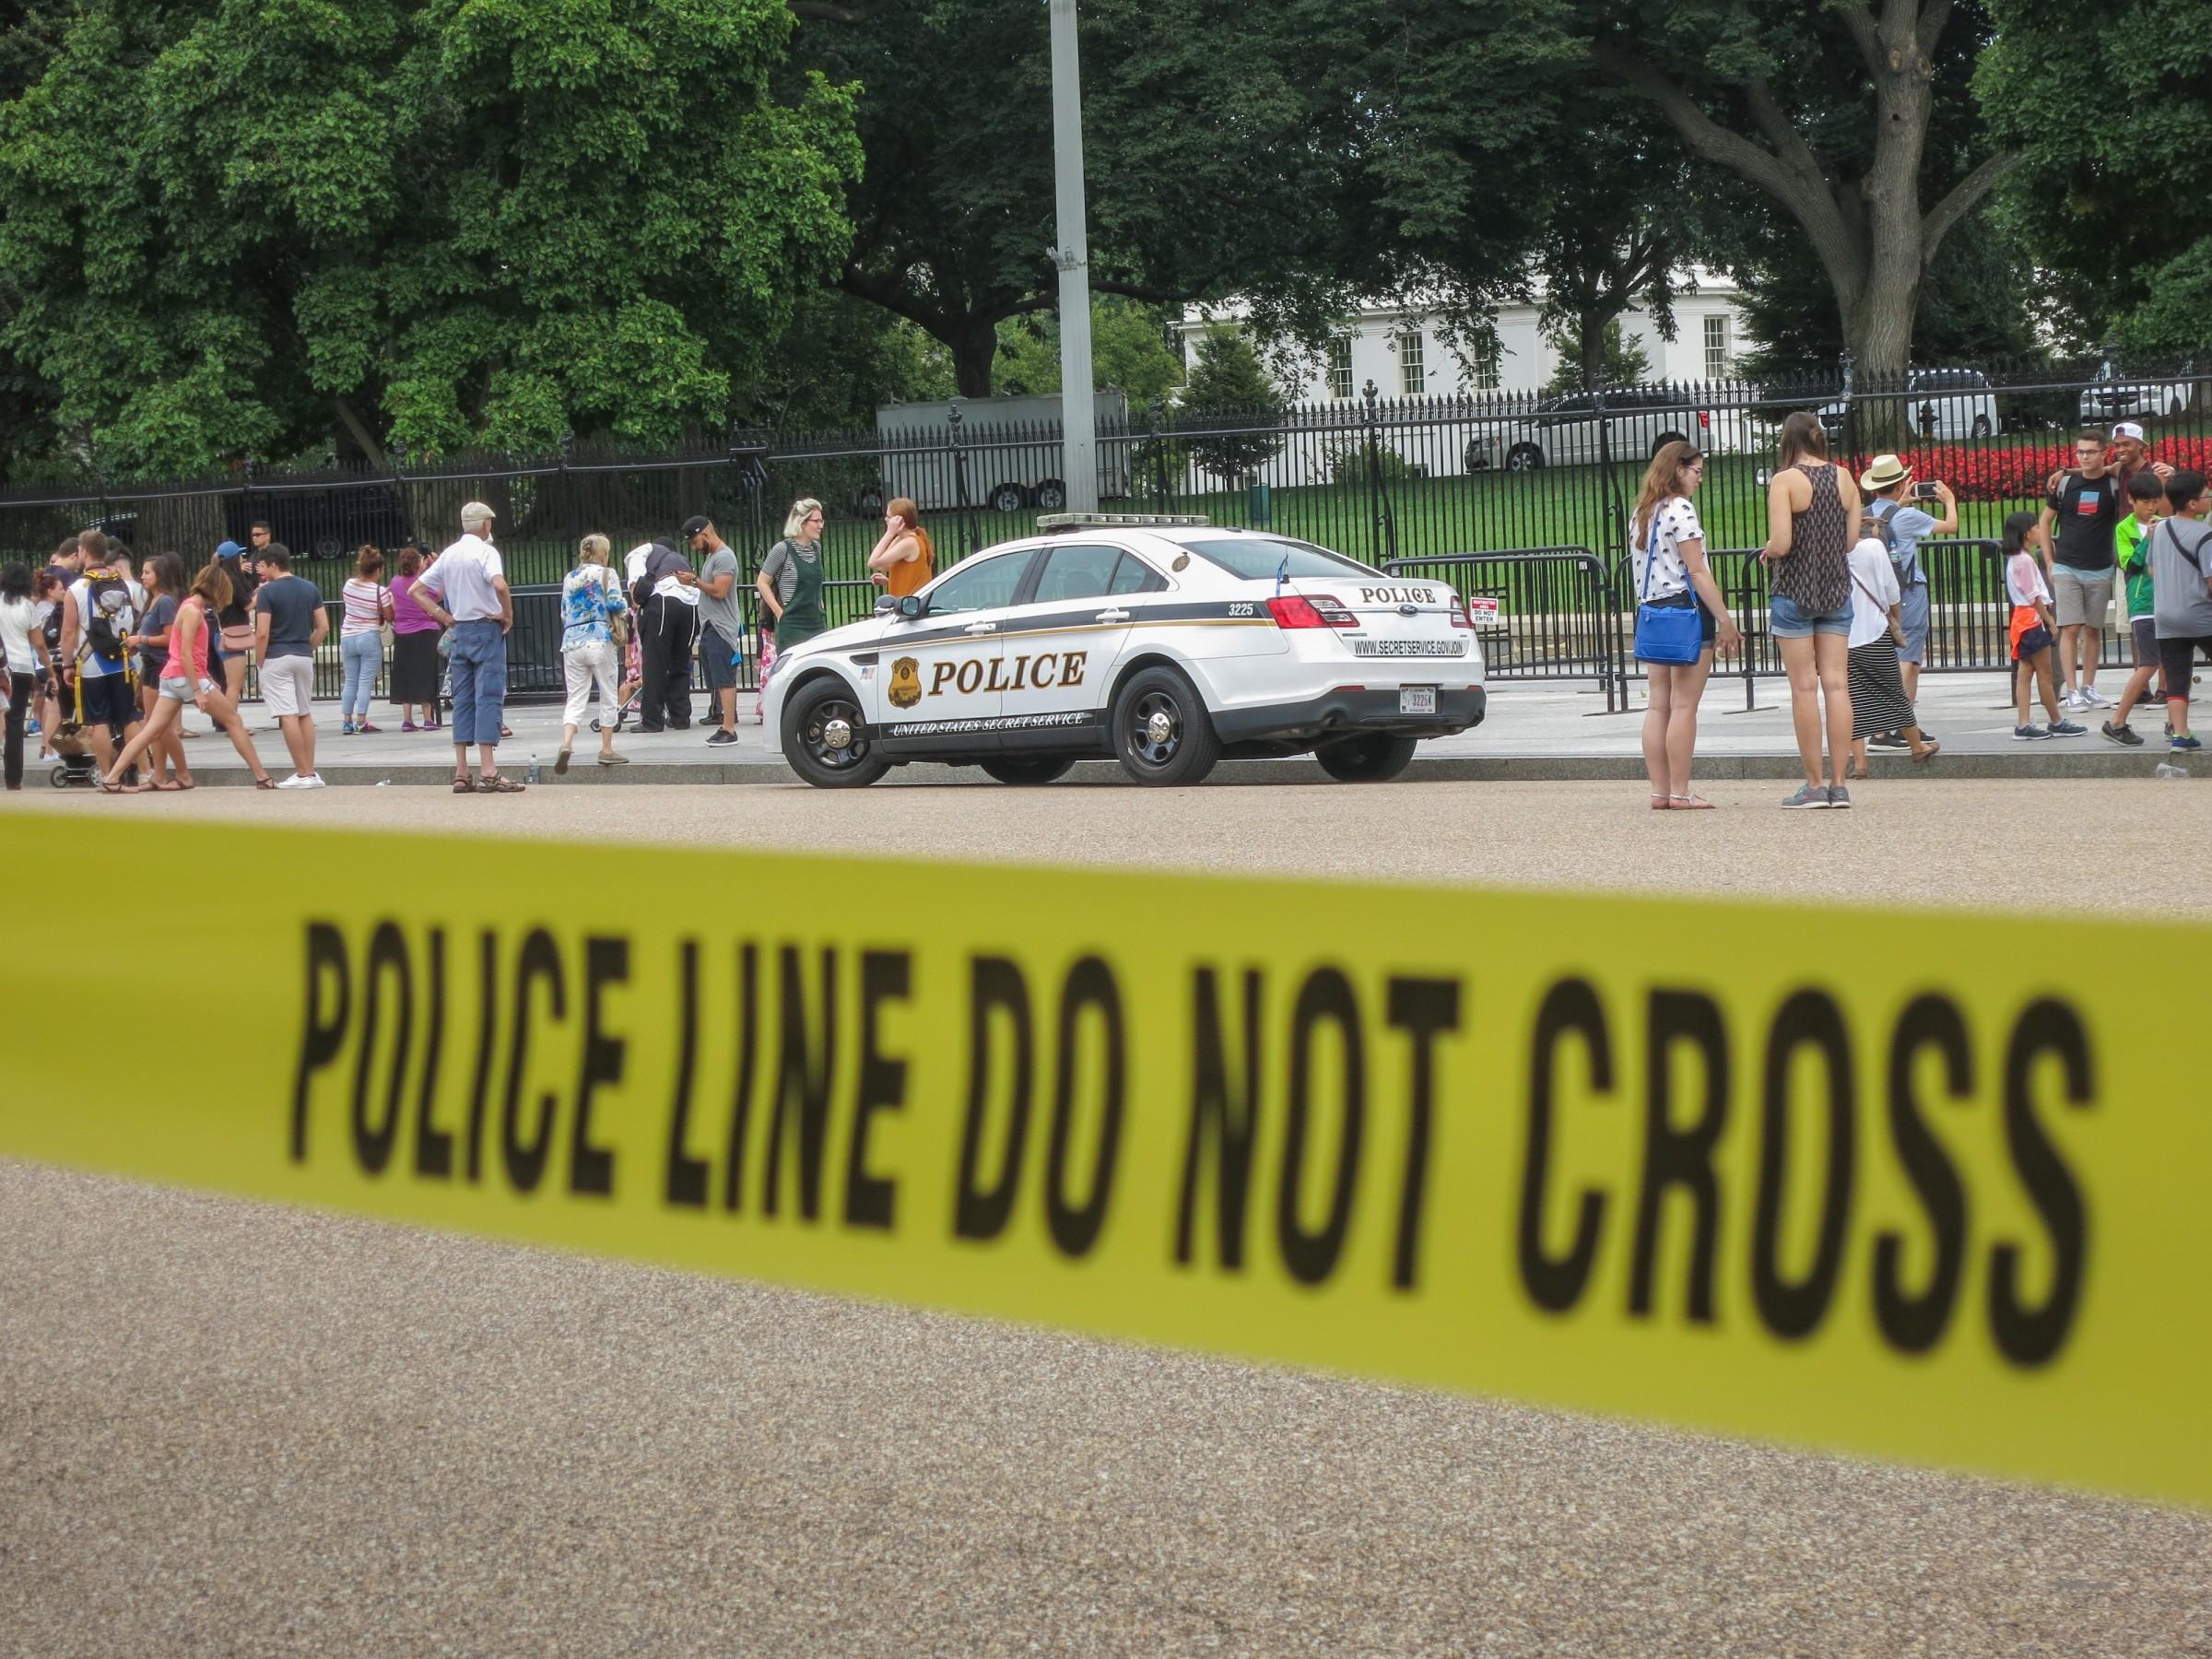 White House Police